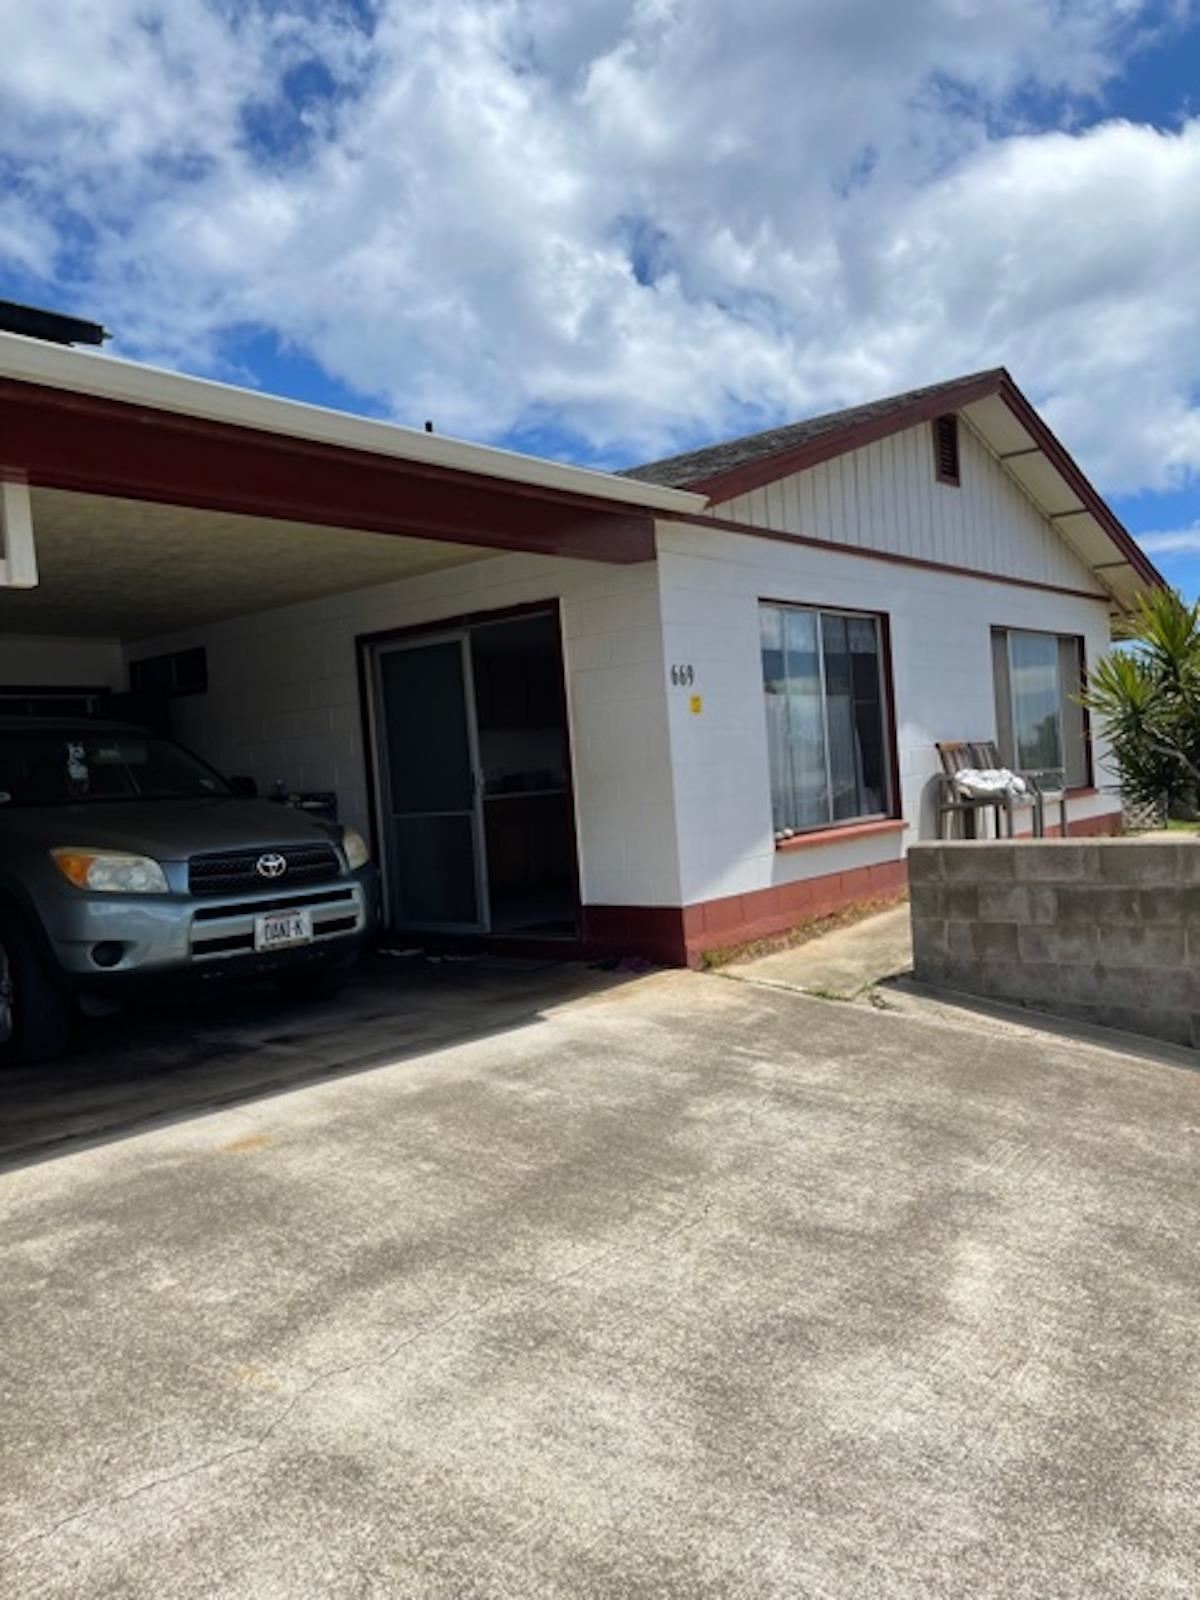 Photo of 669 Pohala St, Wailuku, HI 96793 (MLS # 393149)